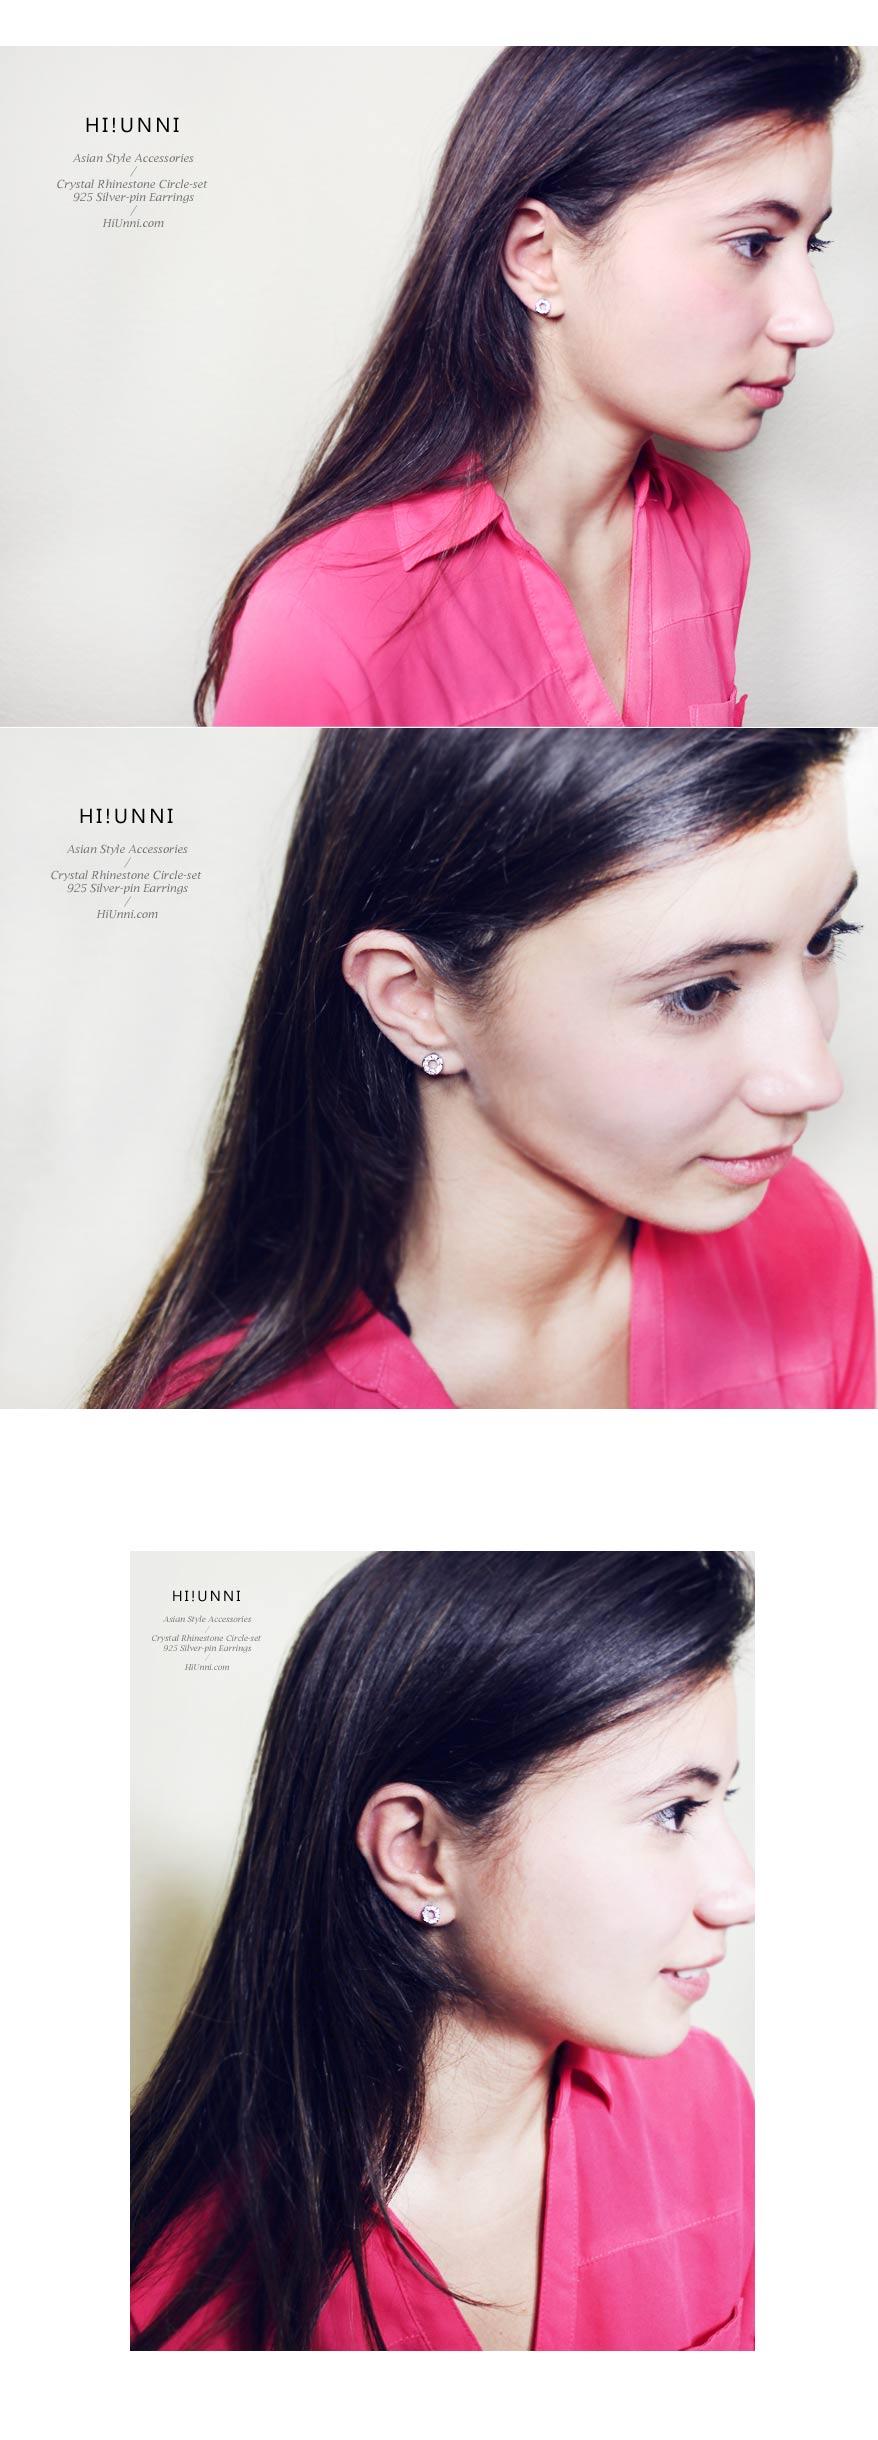 accessories_ear_stud_earrings_korean_asian-style_Crystal_Rhinestone_925-silver_Rhodium-Plated_Nickel-Free_Circle-set_2